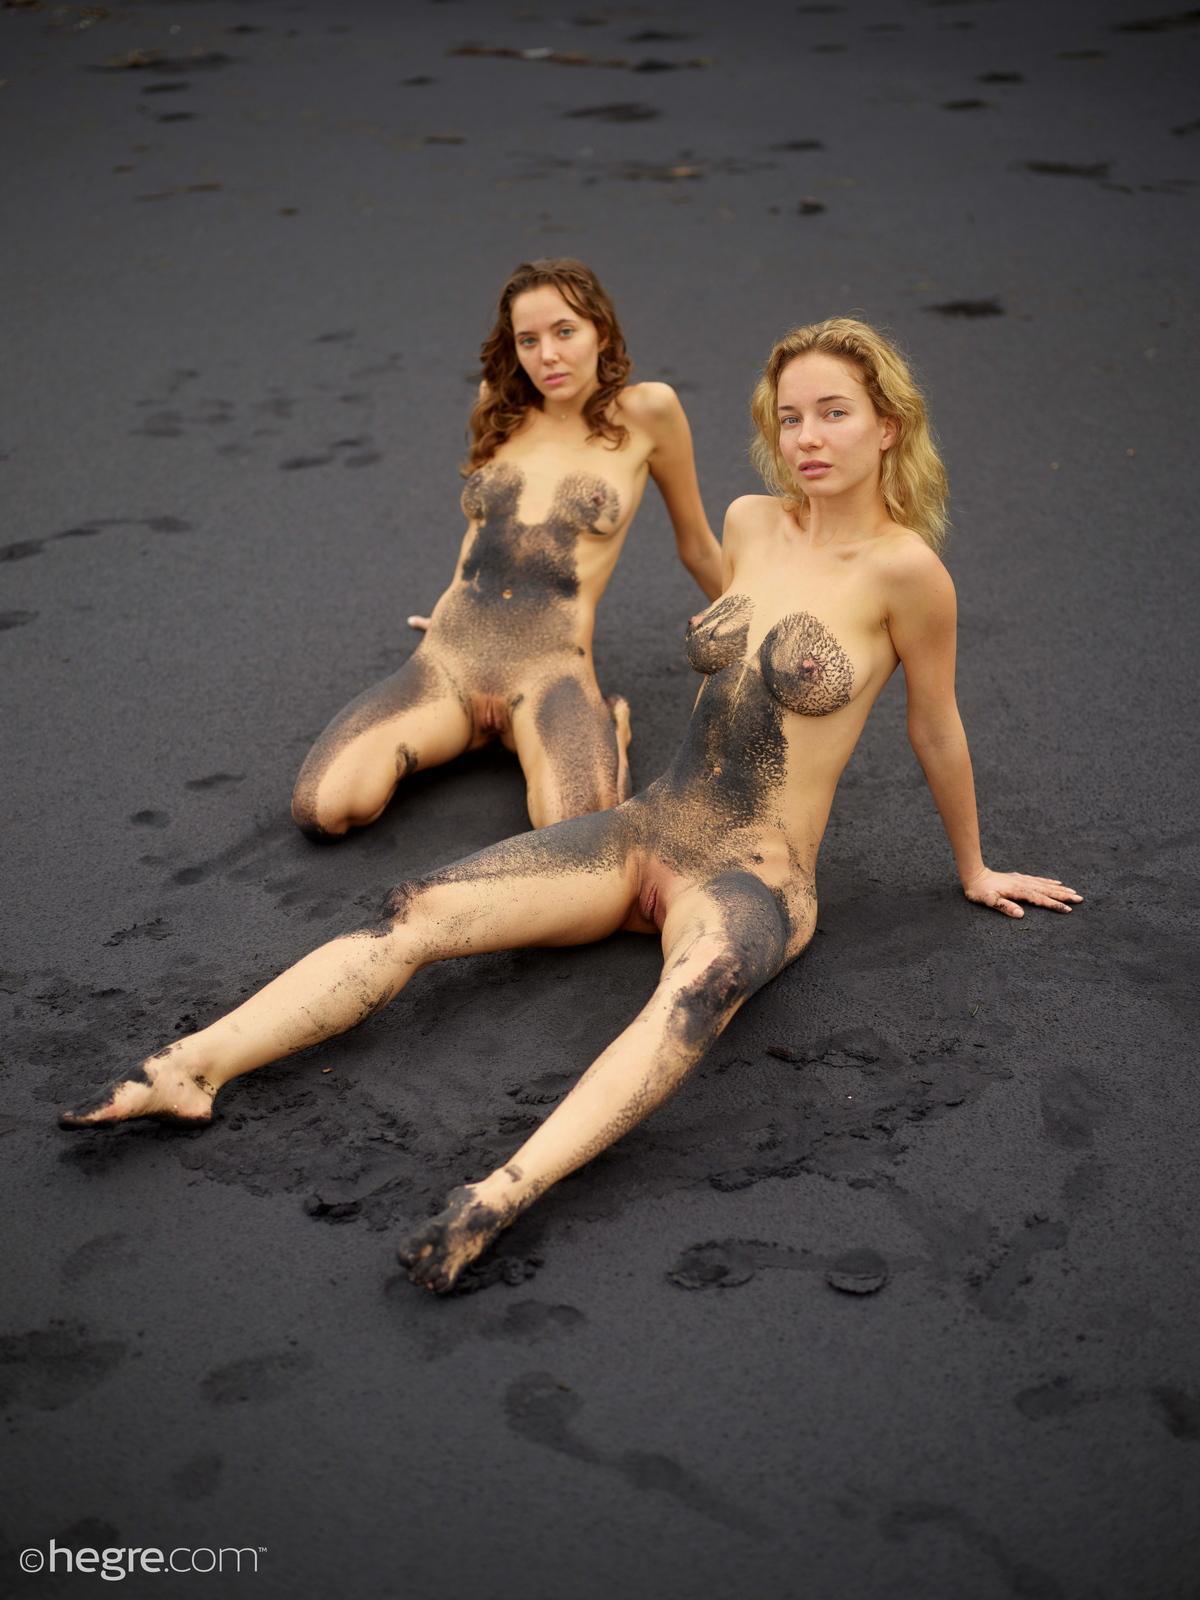 clover-natalia-a-nude-bali-beach-seaside-hegre-25